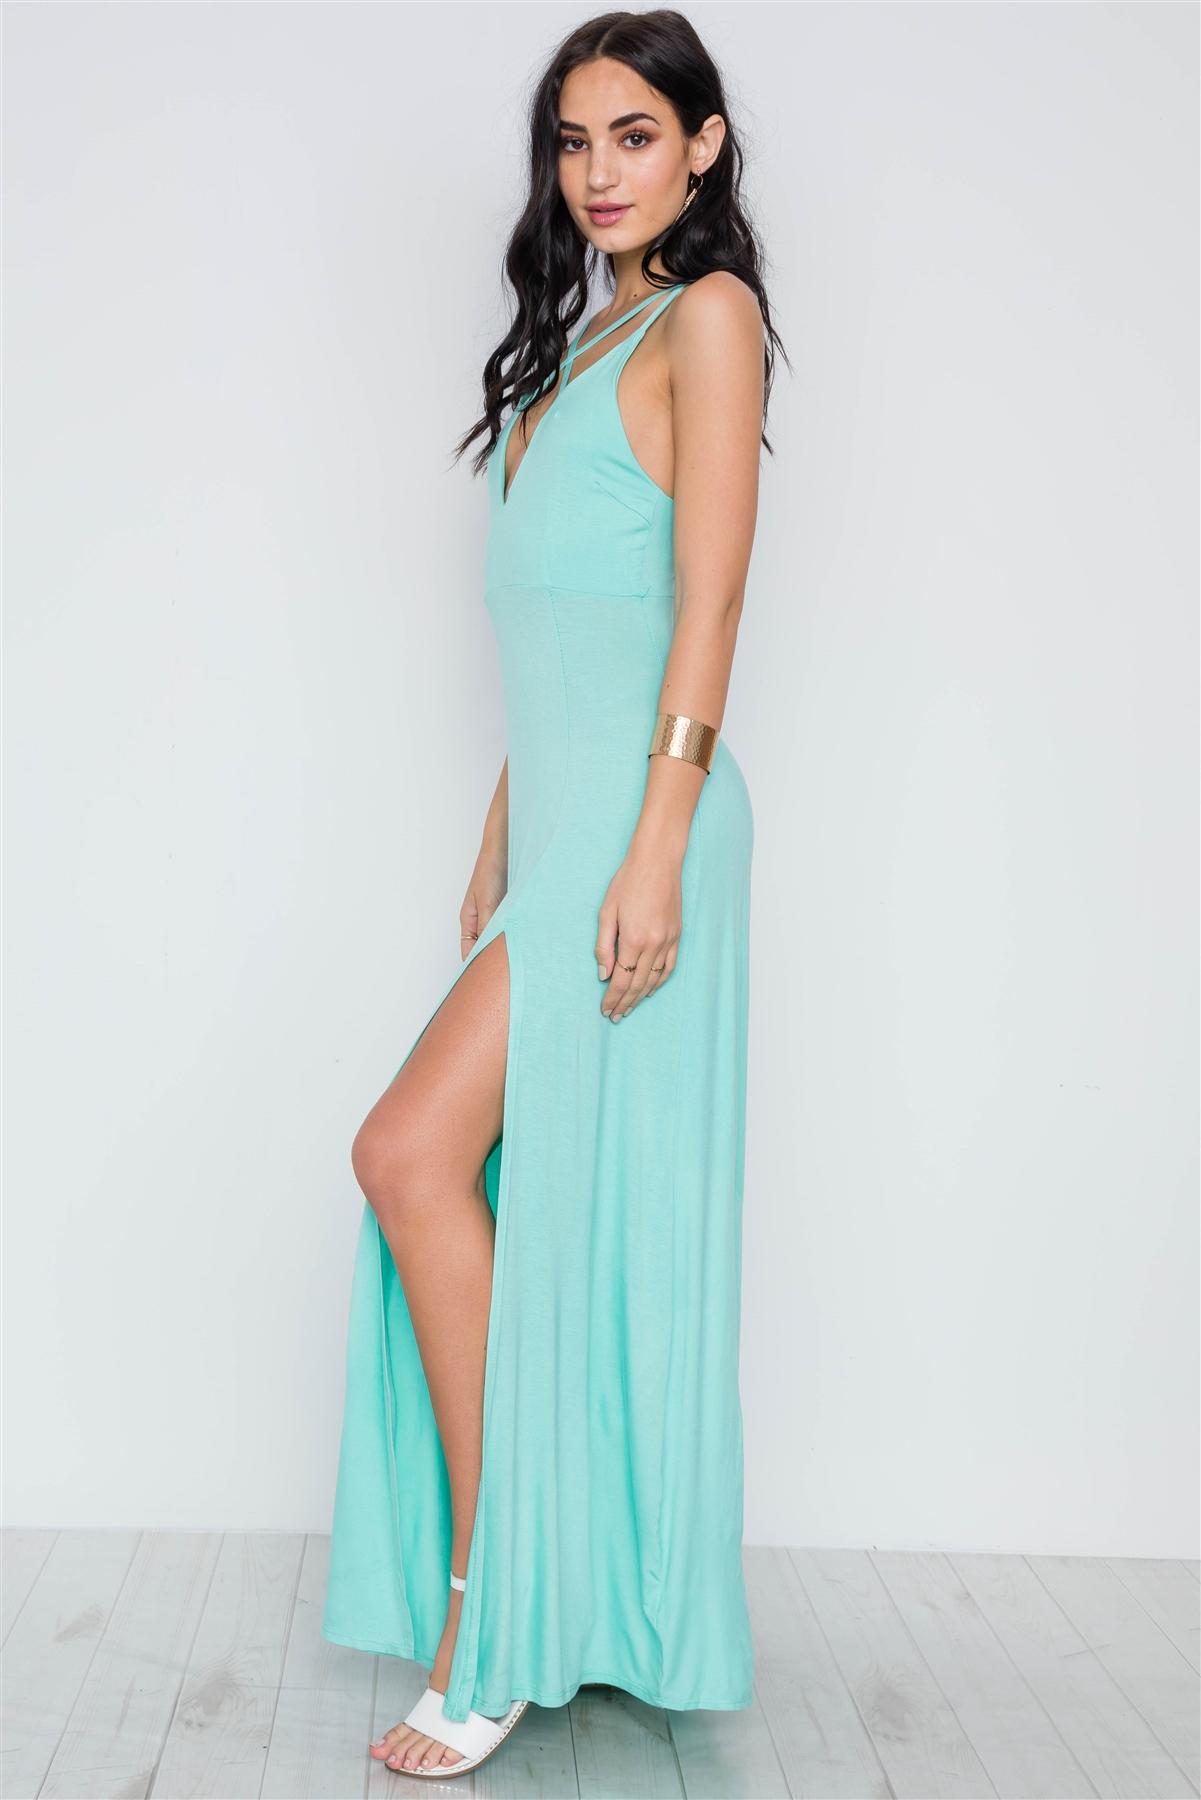 35747e07a9d Sea Foam Turquoise Cami Strap Side Slit Solid Maxi Dress   1-2-2-1